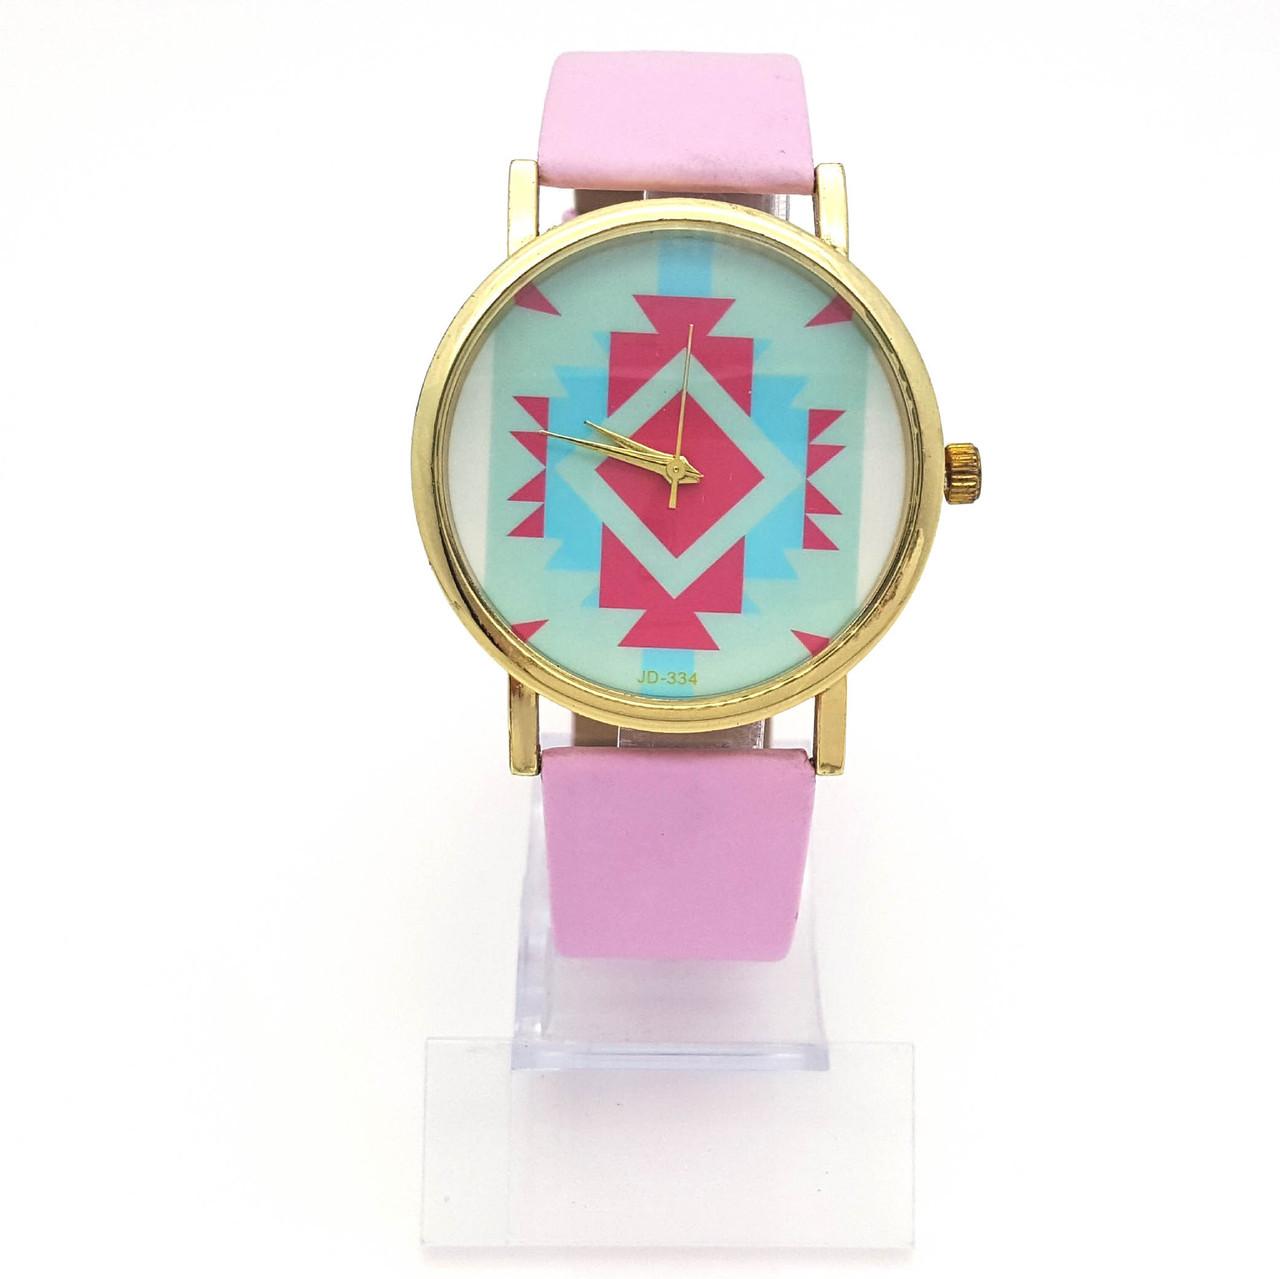 Часы на розовом ремешке, с орнаментом, длинна ремешка 18,5-22, циферблат 38мм